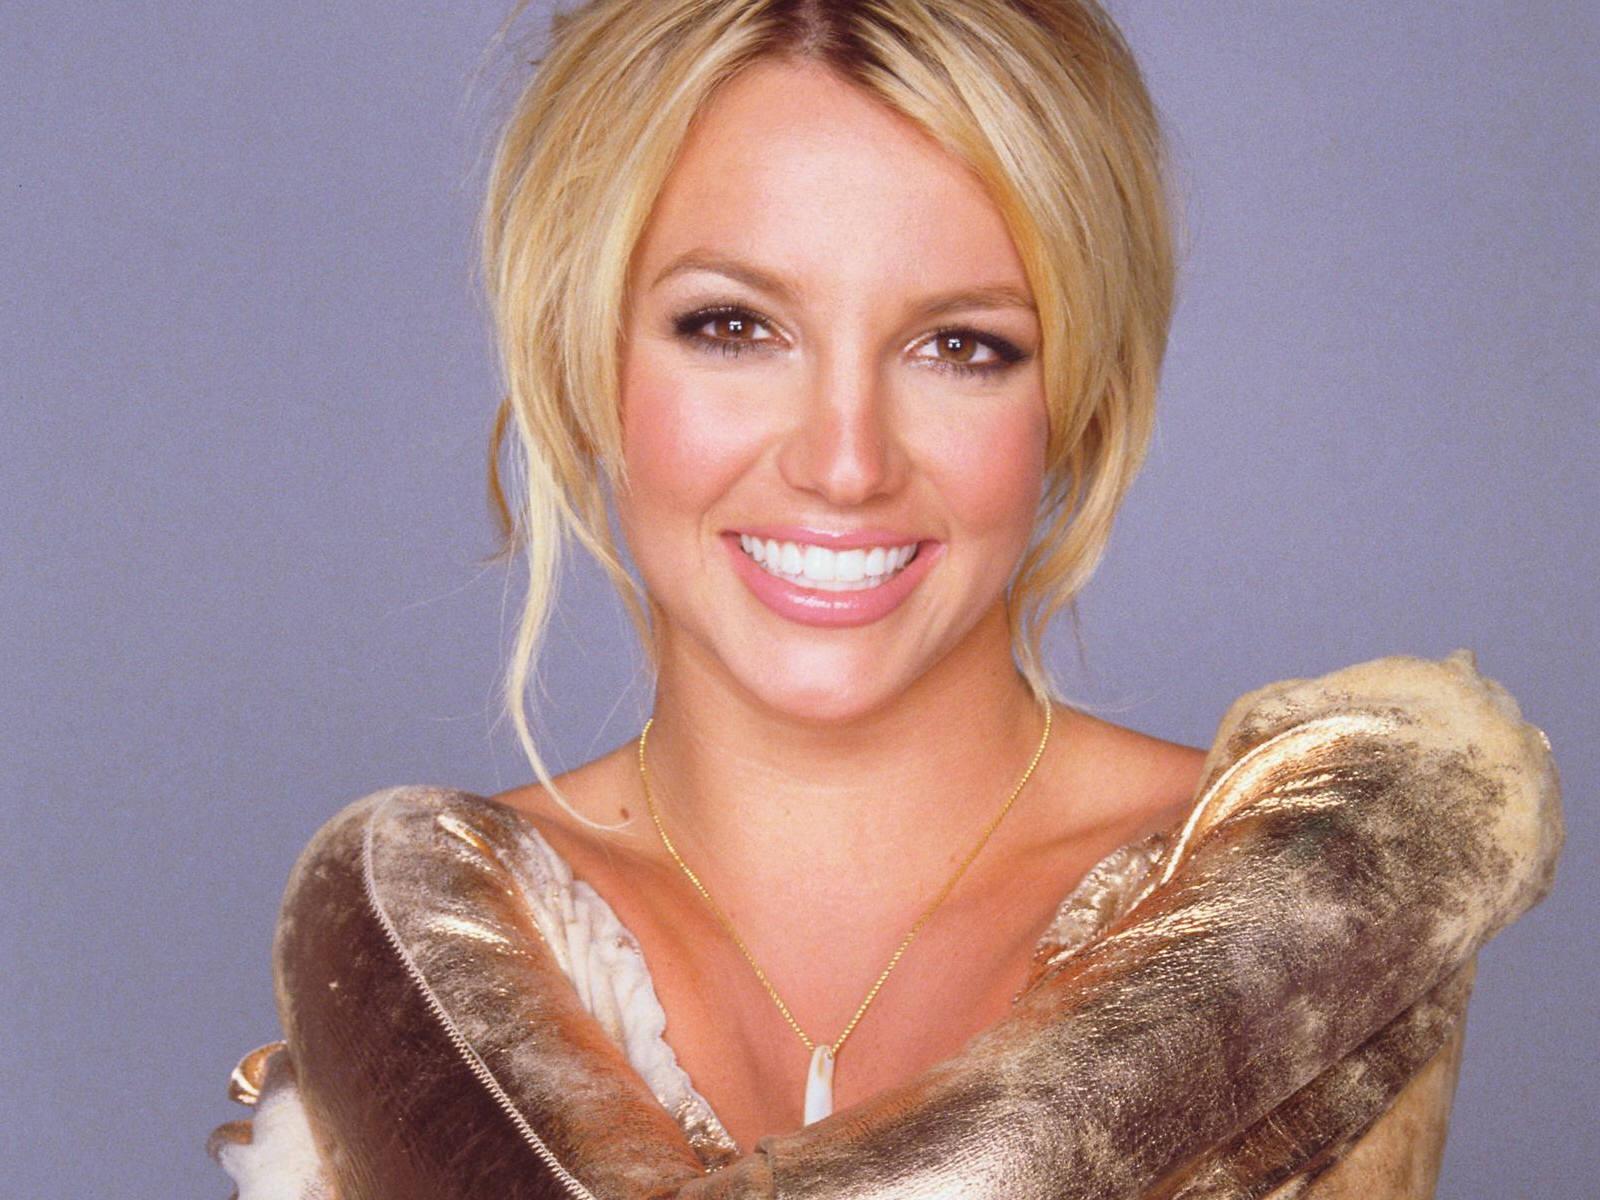 http://3.bp.blogspot.com/-zPdn8CRvLKs/TzKJbAXi8pI/AAAAAAAADbs/Ro-esFMM4ks/s1600/Britney-Spears-2011.jpeg